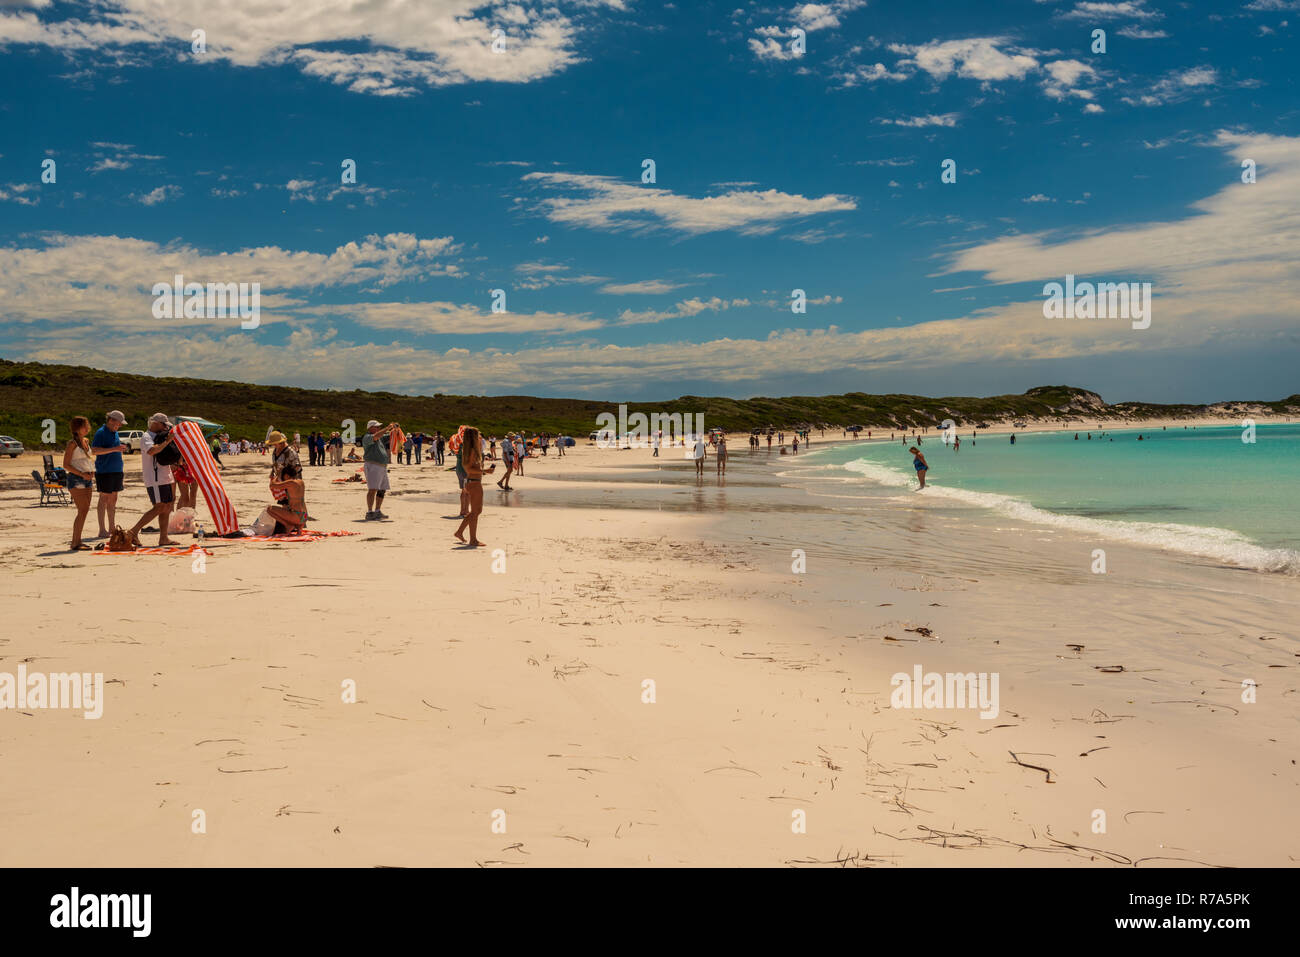 Visitors Enjoy the Beach at Hellfire Bay in Western Australia - Stock Image